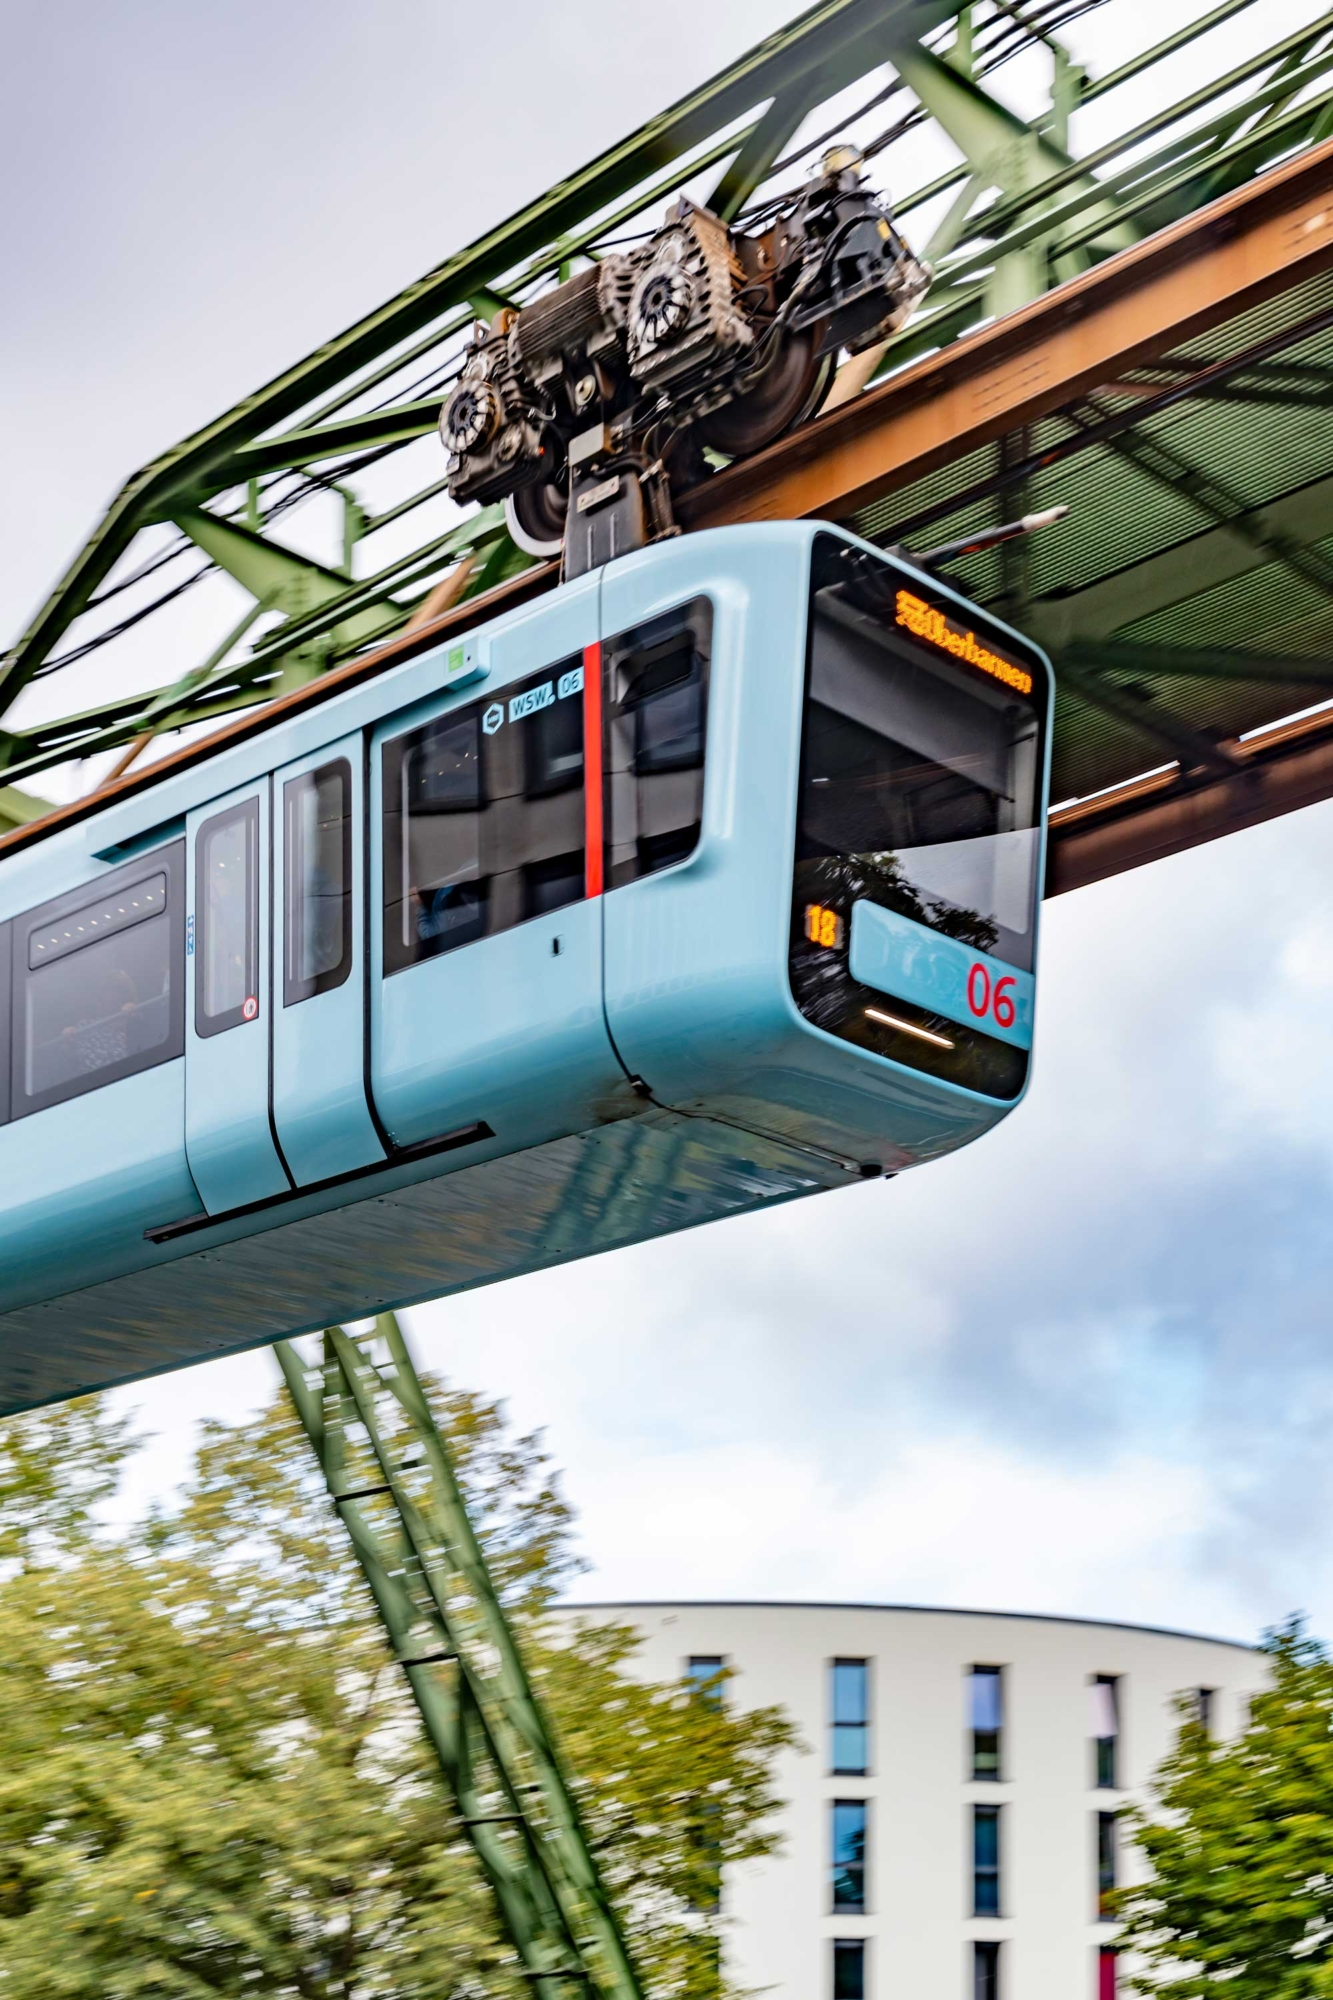 Wuppertal Schwebebahn Monorail, Germany 190905wc859430